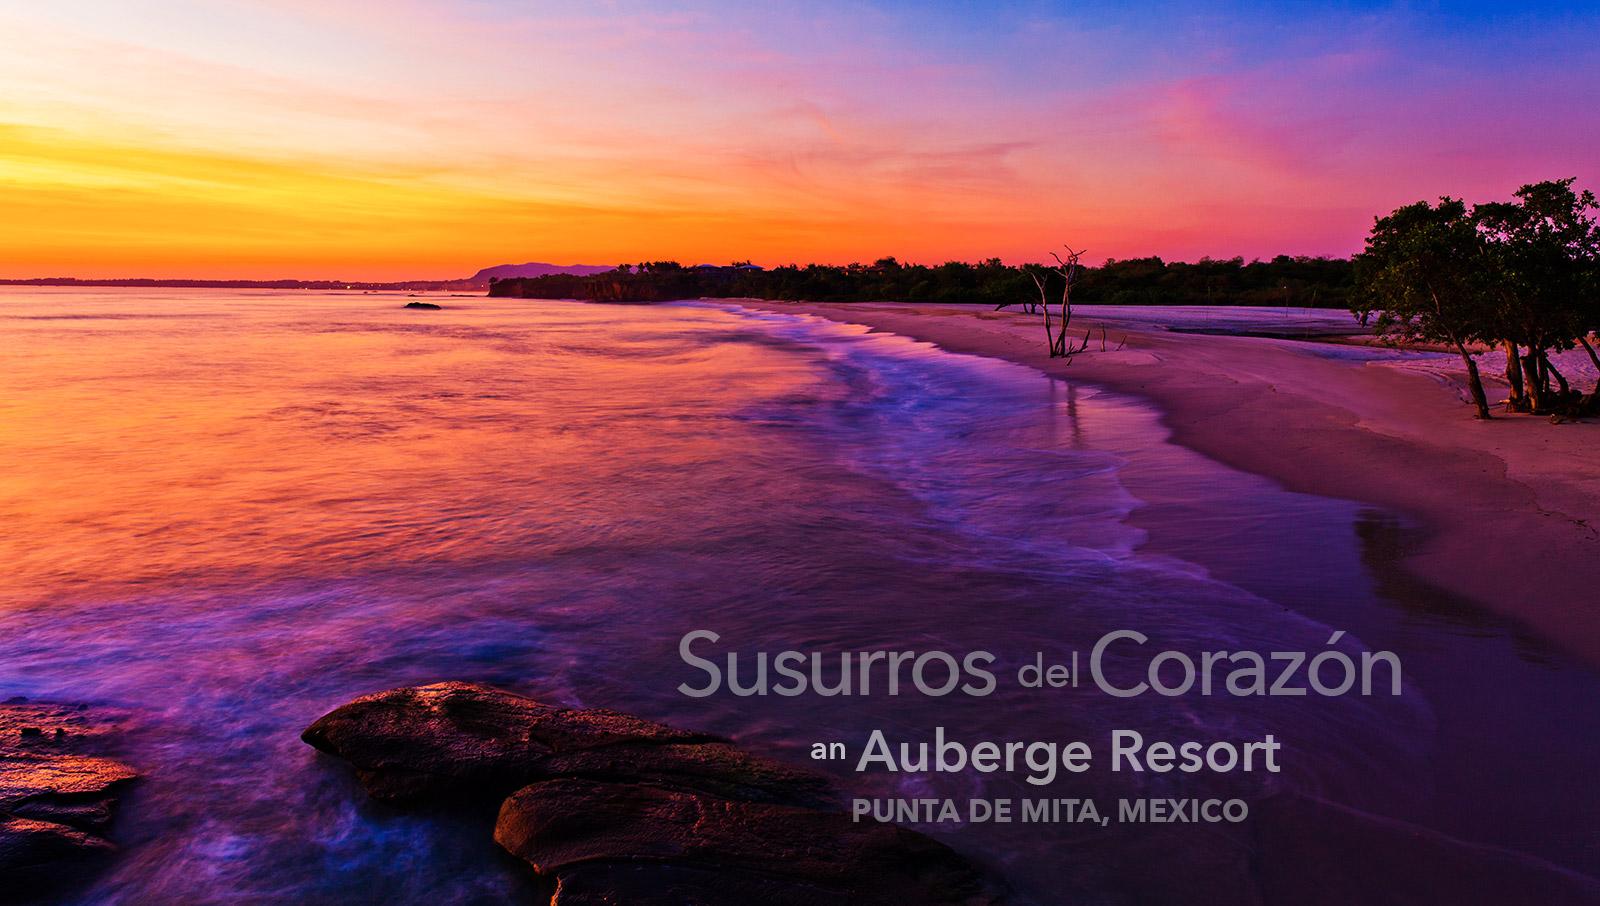 Auberge Residences, Punta de Mita, Riviera Nayarit, Mexico